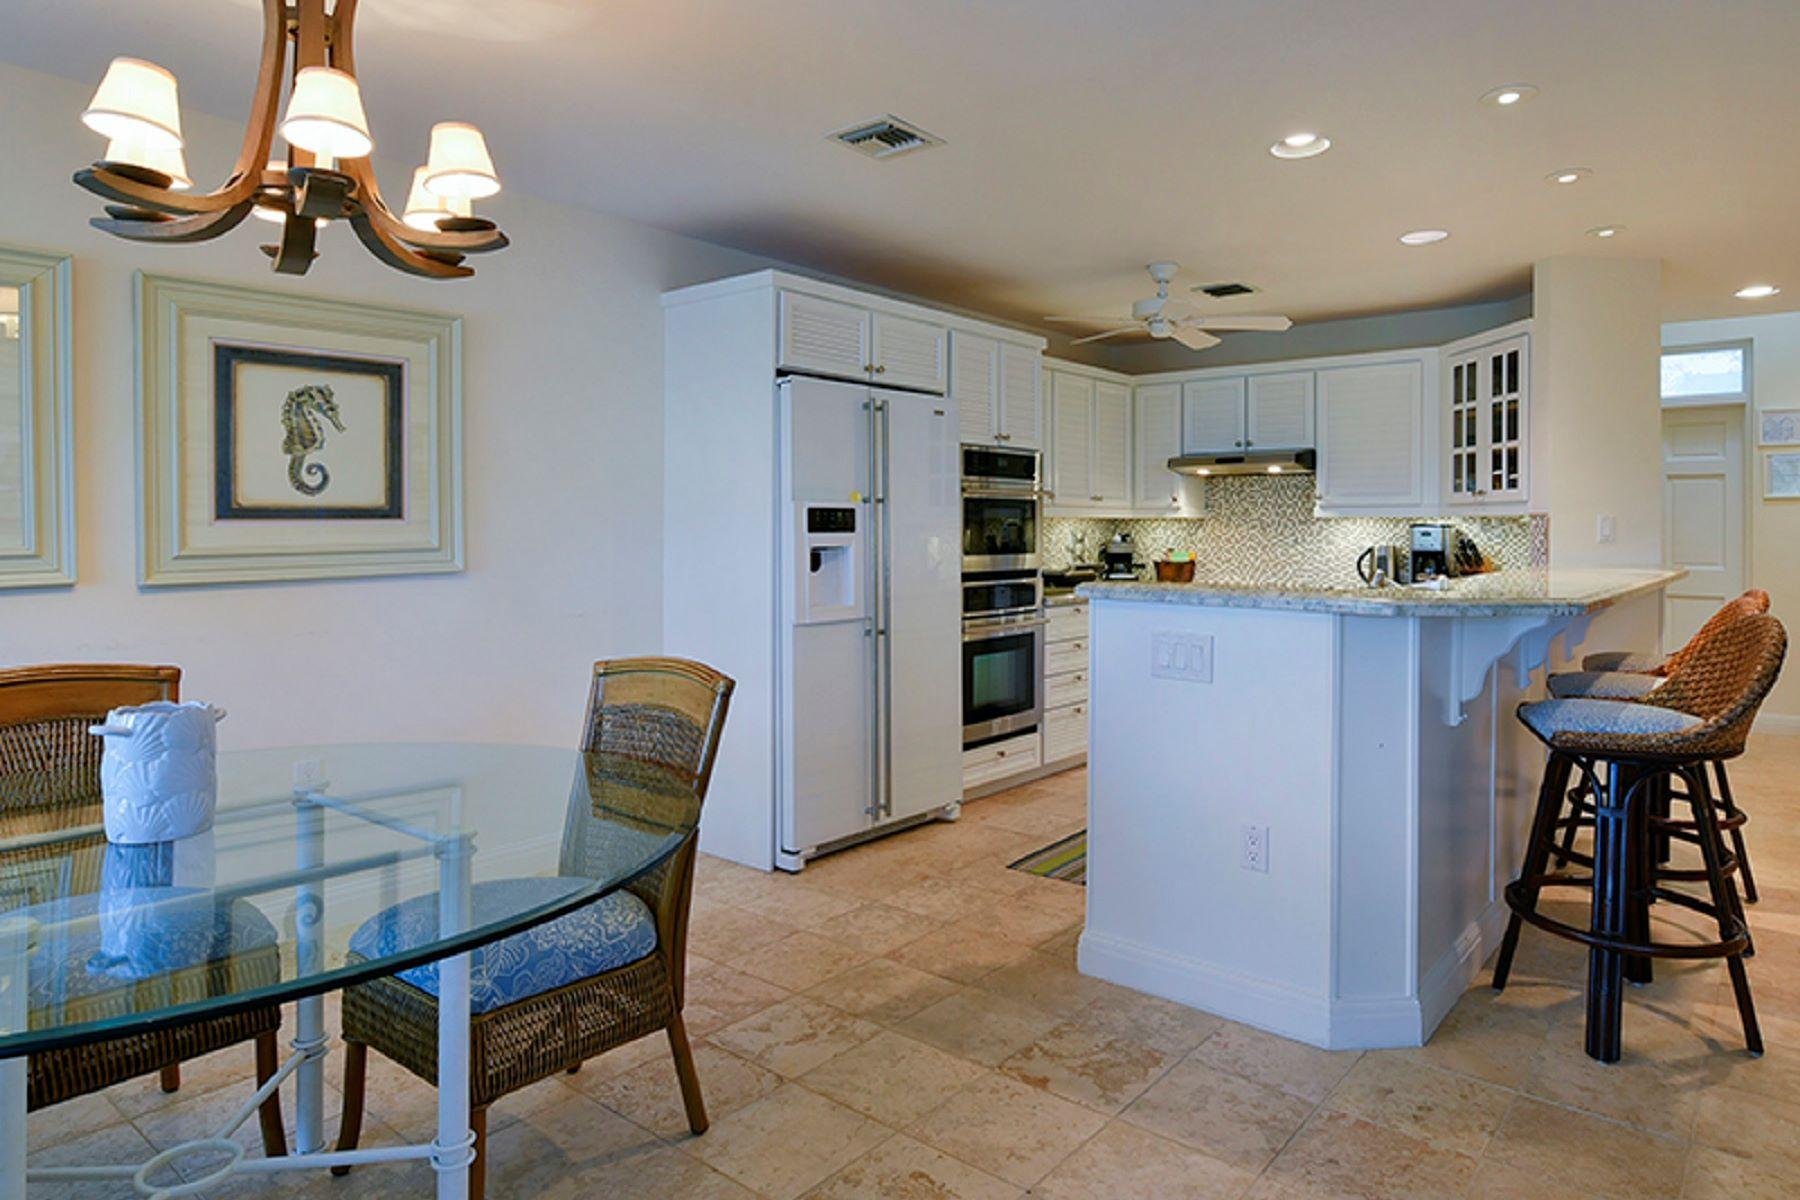 Additional photo for property listing at Islamorada's Best Kept Secret 80630 Old Highway # 306 Islamorada, Φλοριντα 33036 Ηνωμενεσ Πολιτειεσ